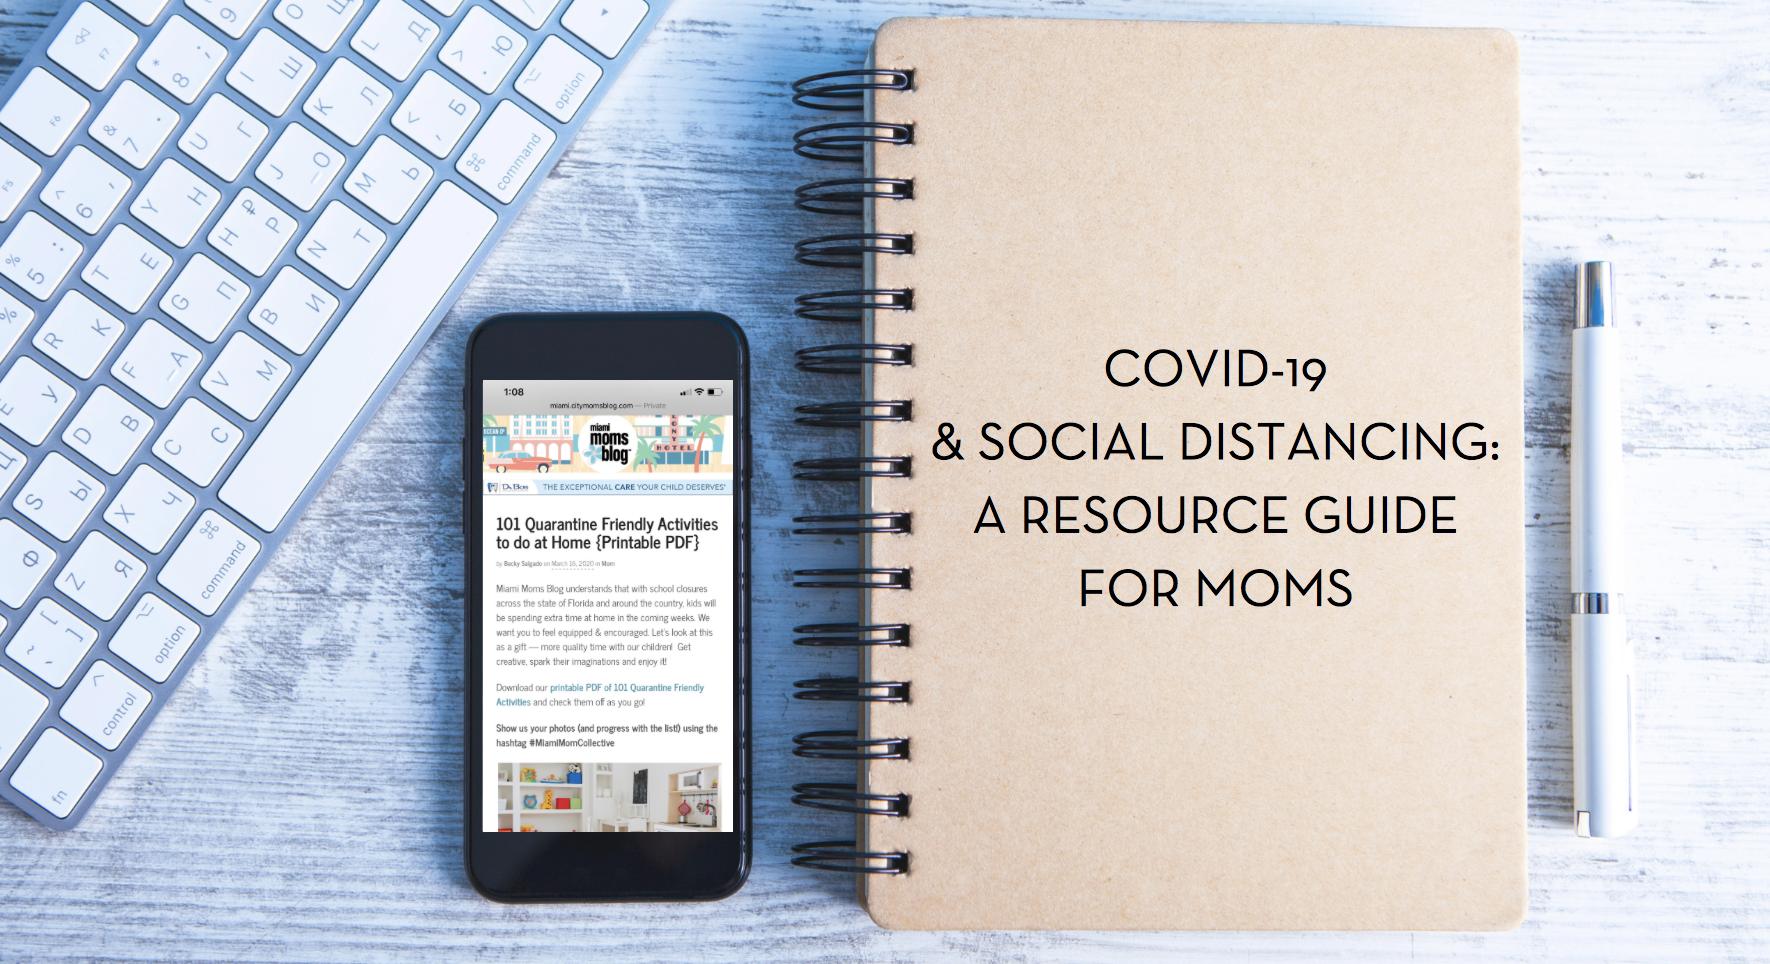 COVID-19 Coronavirus & Social Distancing: A Resource Guide for Moms Miami Moms Blog